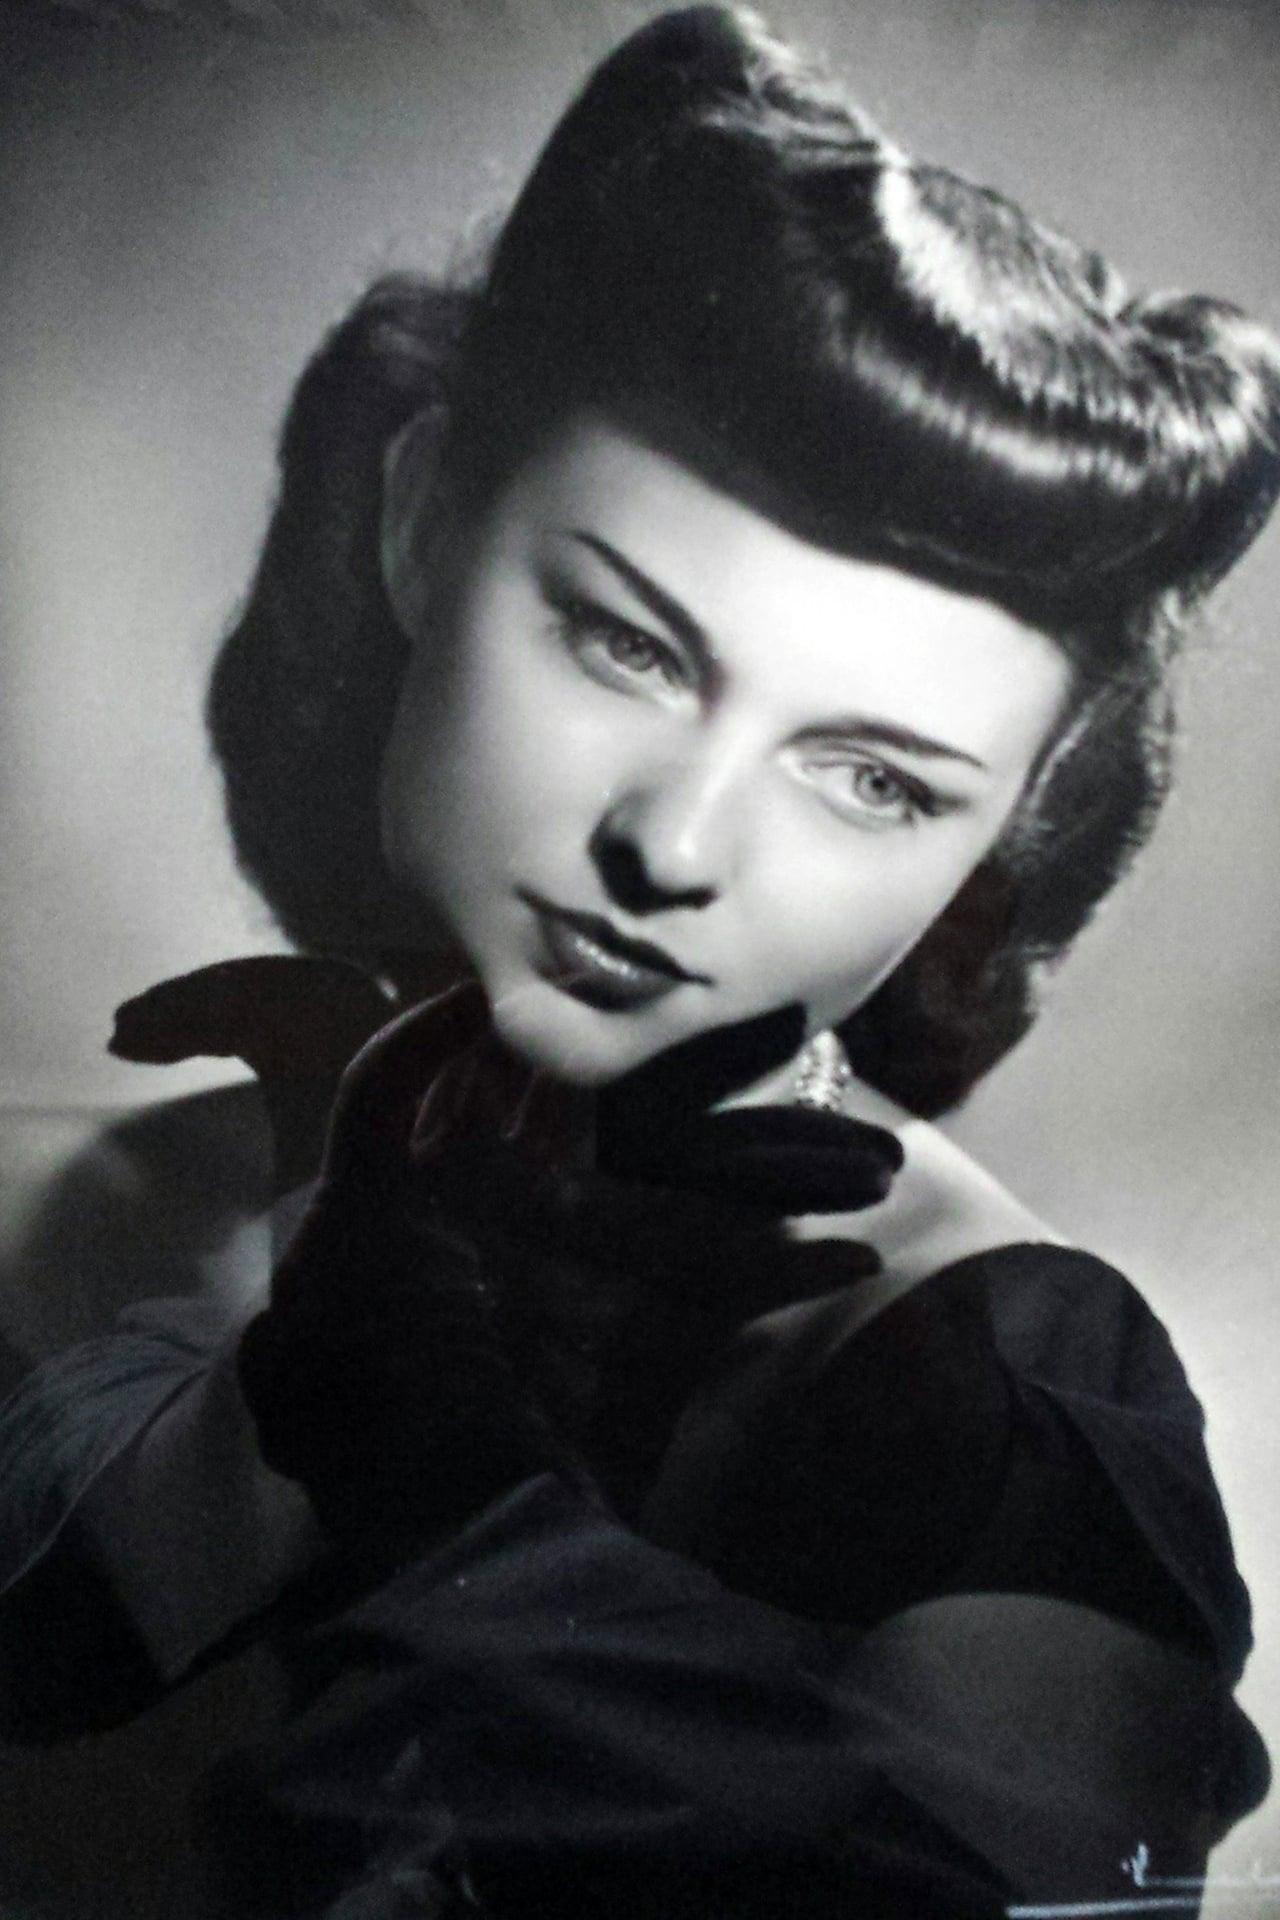 Lenore Aubert